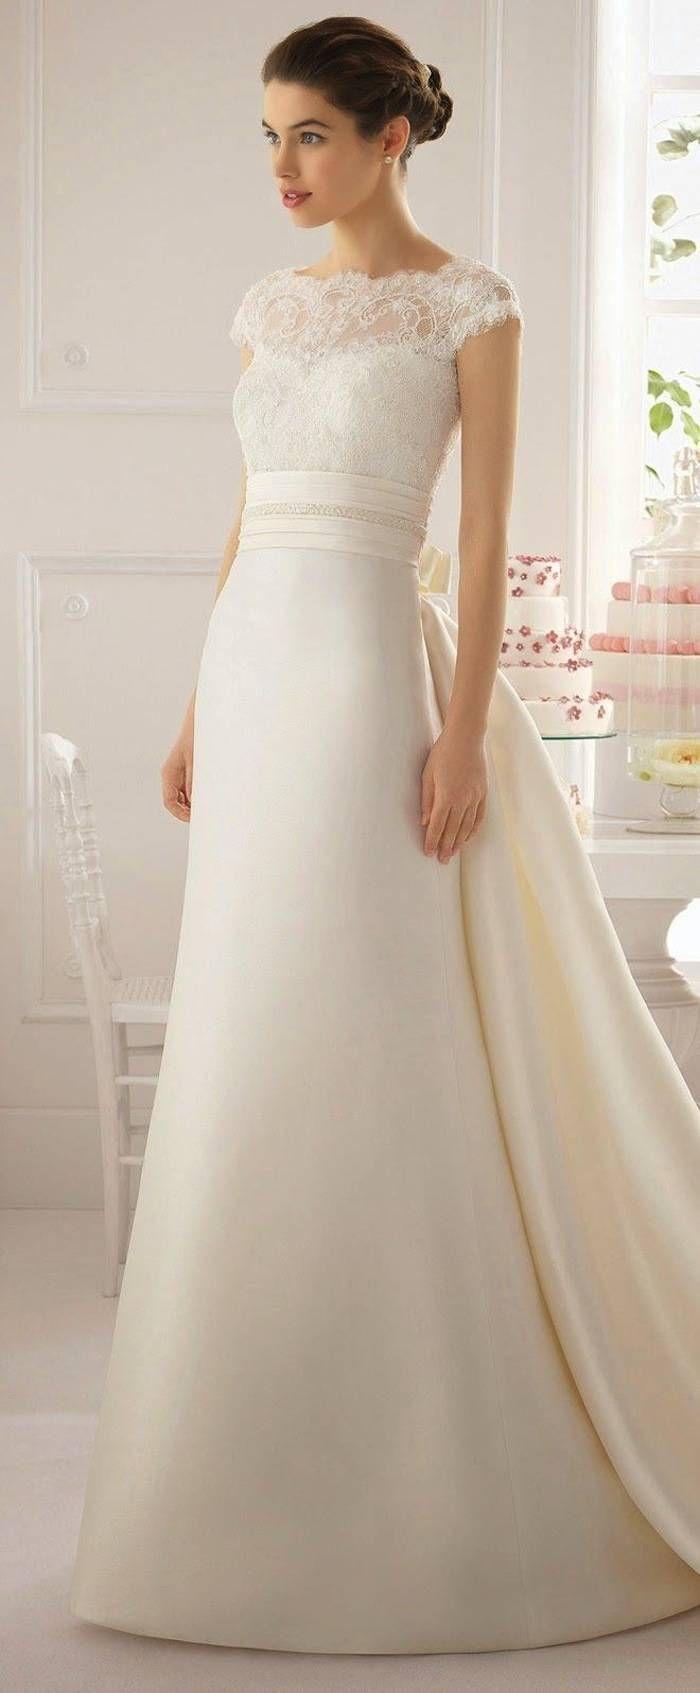 Modest Wedding Dresses With Pretty Details Modwedding Elegant Wedding Dress Wedding Dresses Wedding Dresses Simple [ 1693 x 700 Pixel ]